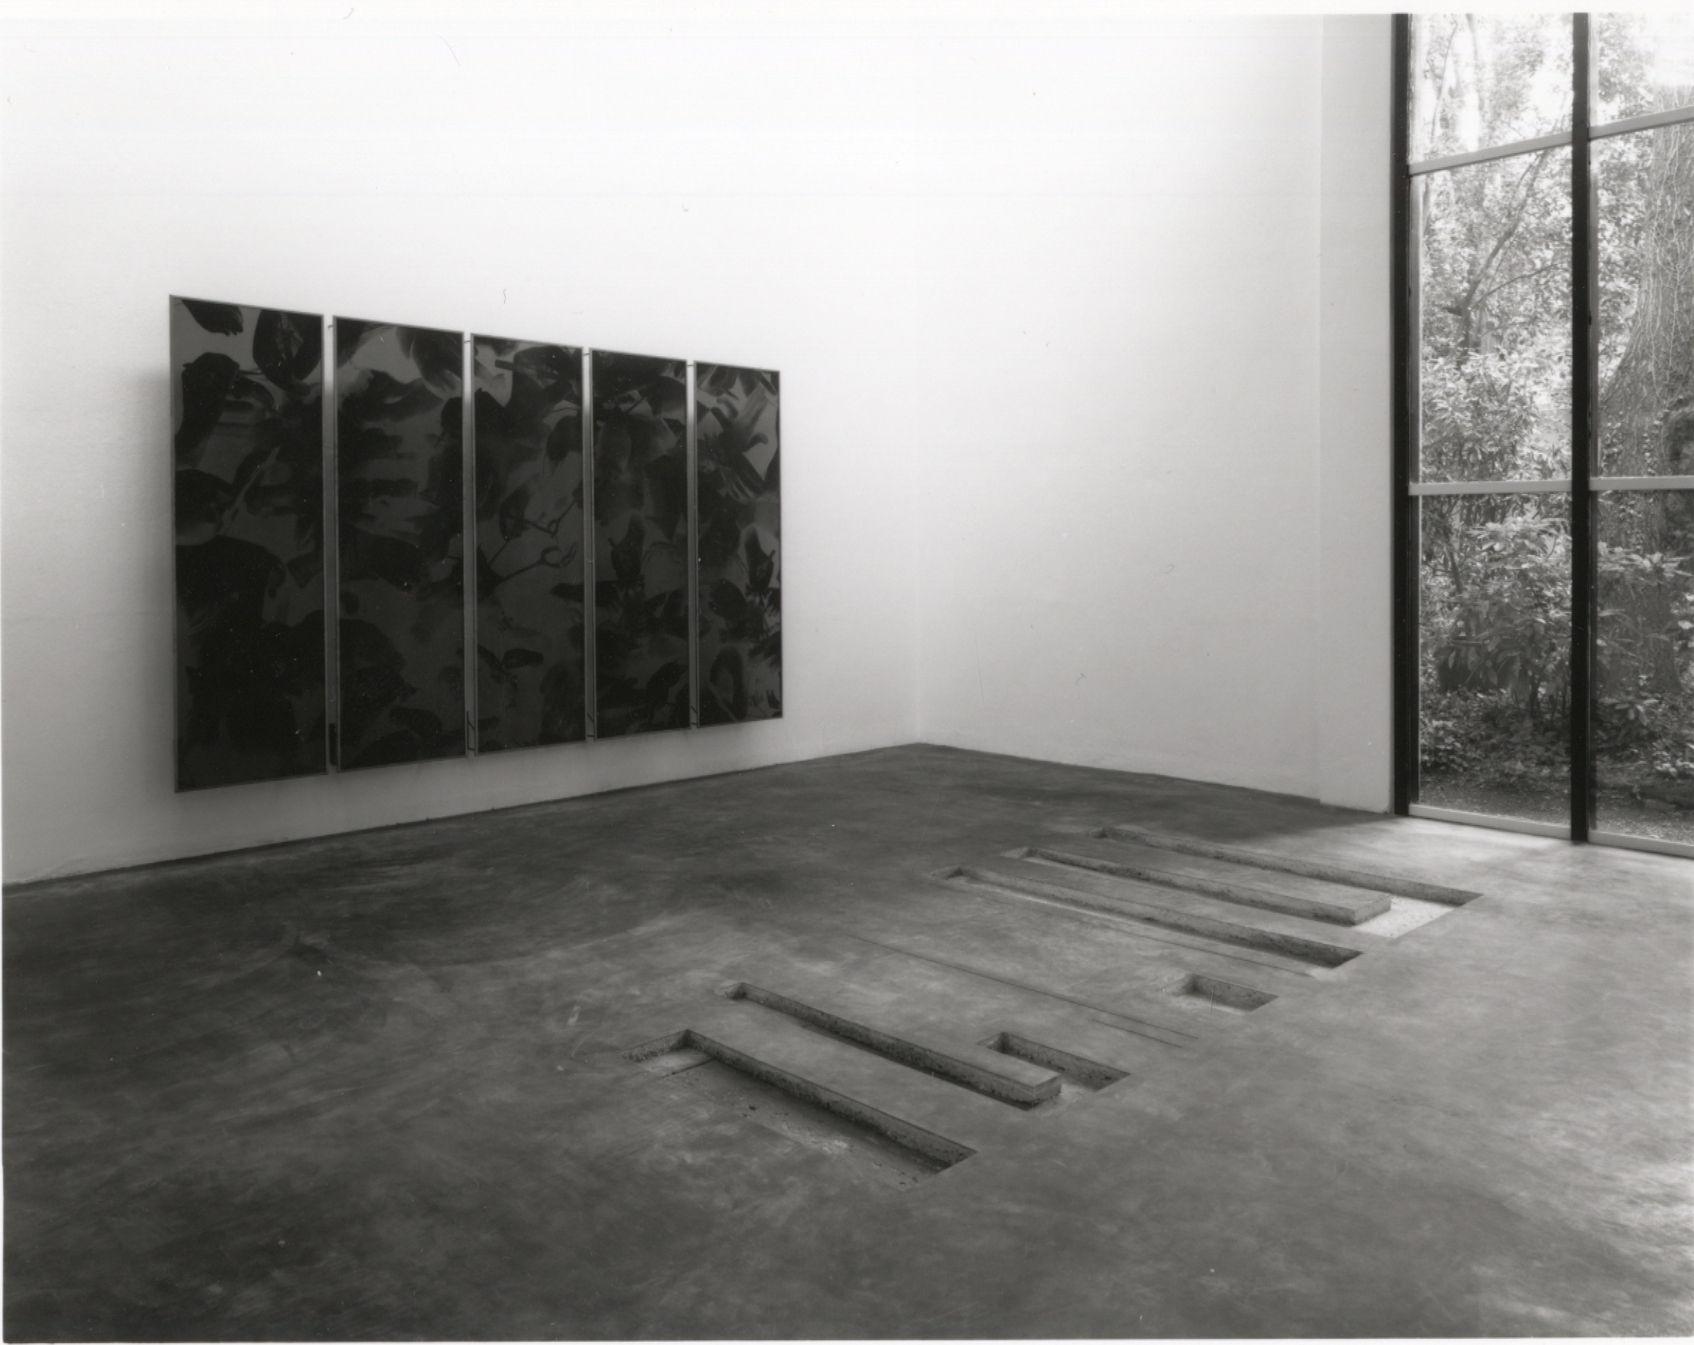 Niek Kemps : Jan Vercruysse : Biennale di Venezia 1993 :